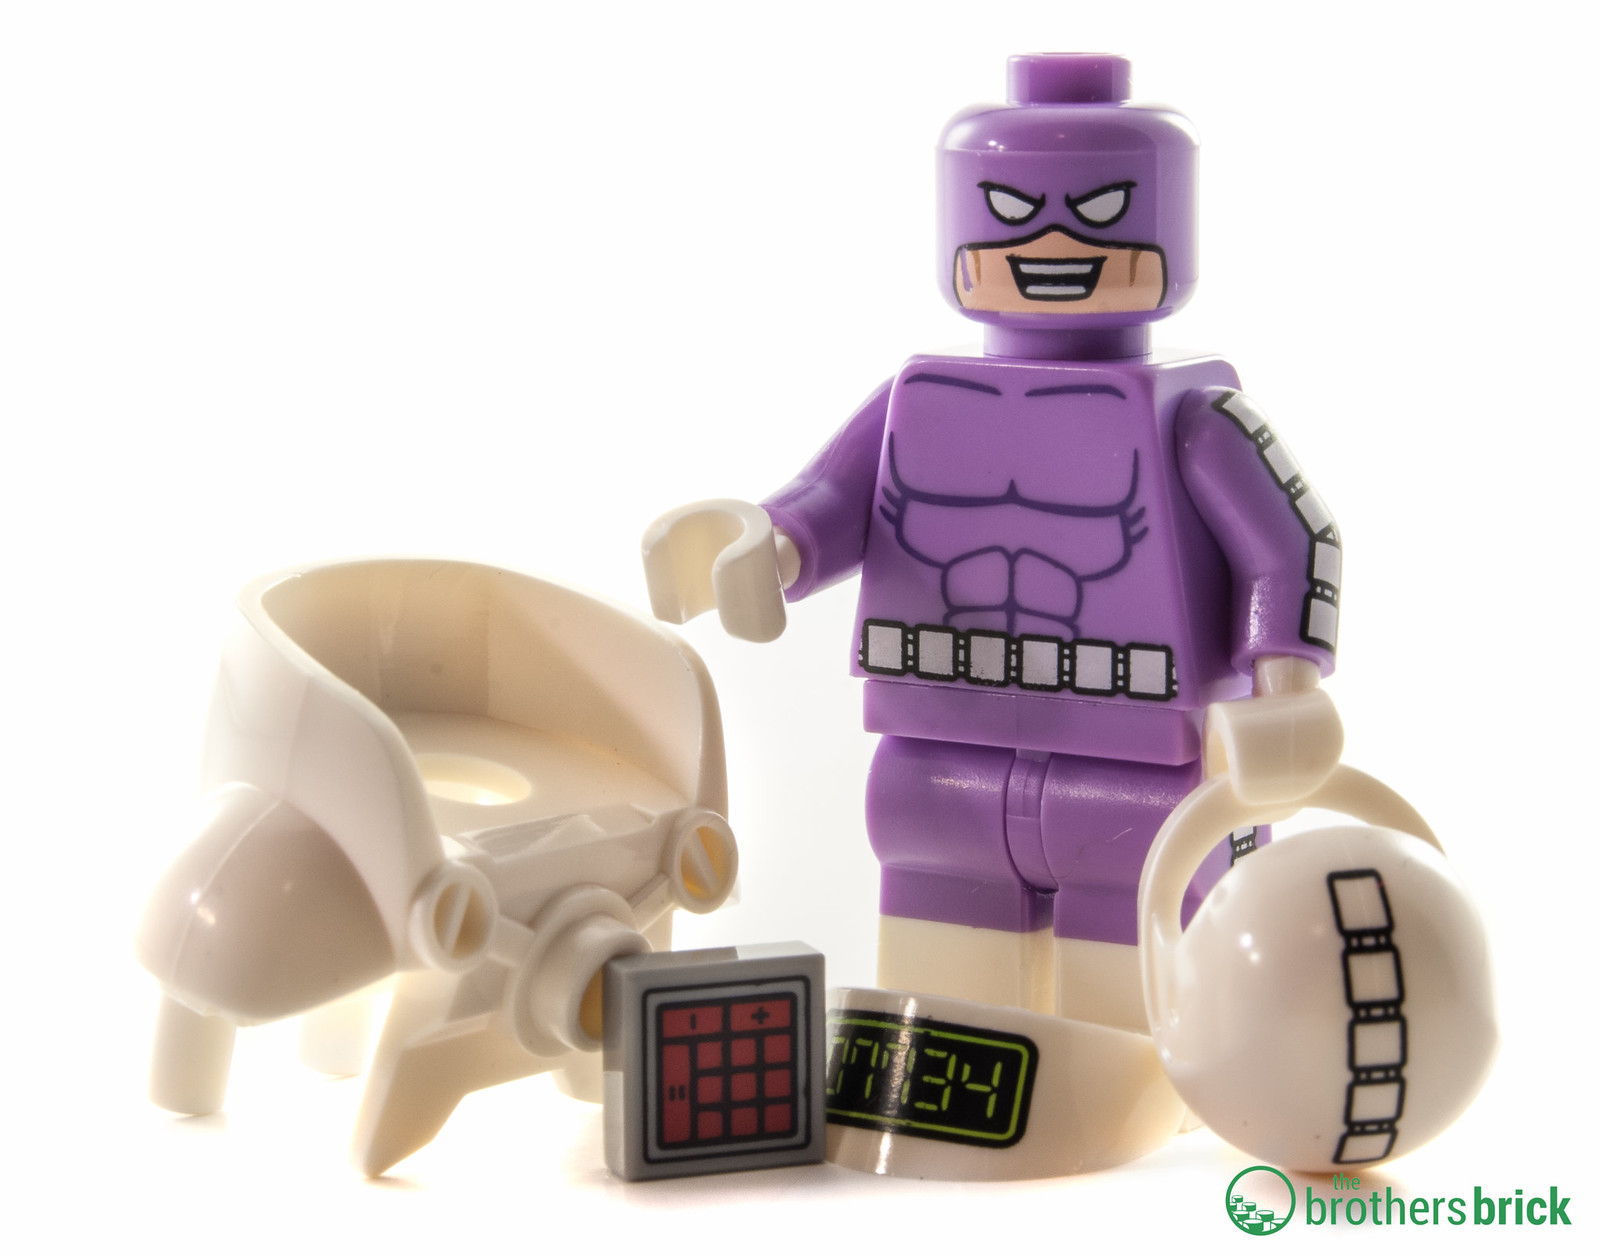 The Lego Batman Movie Collectible Minifigures Feel Guide